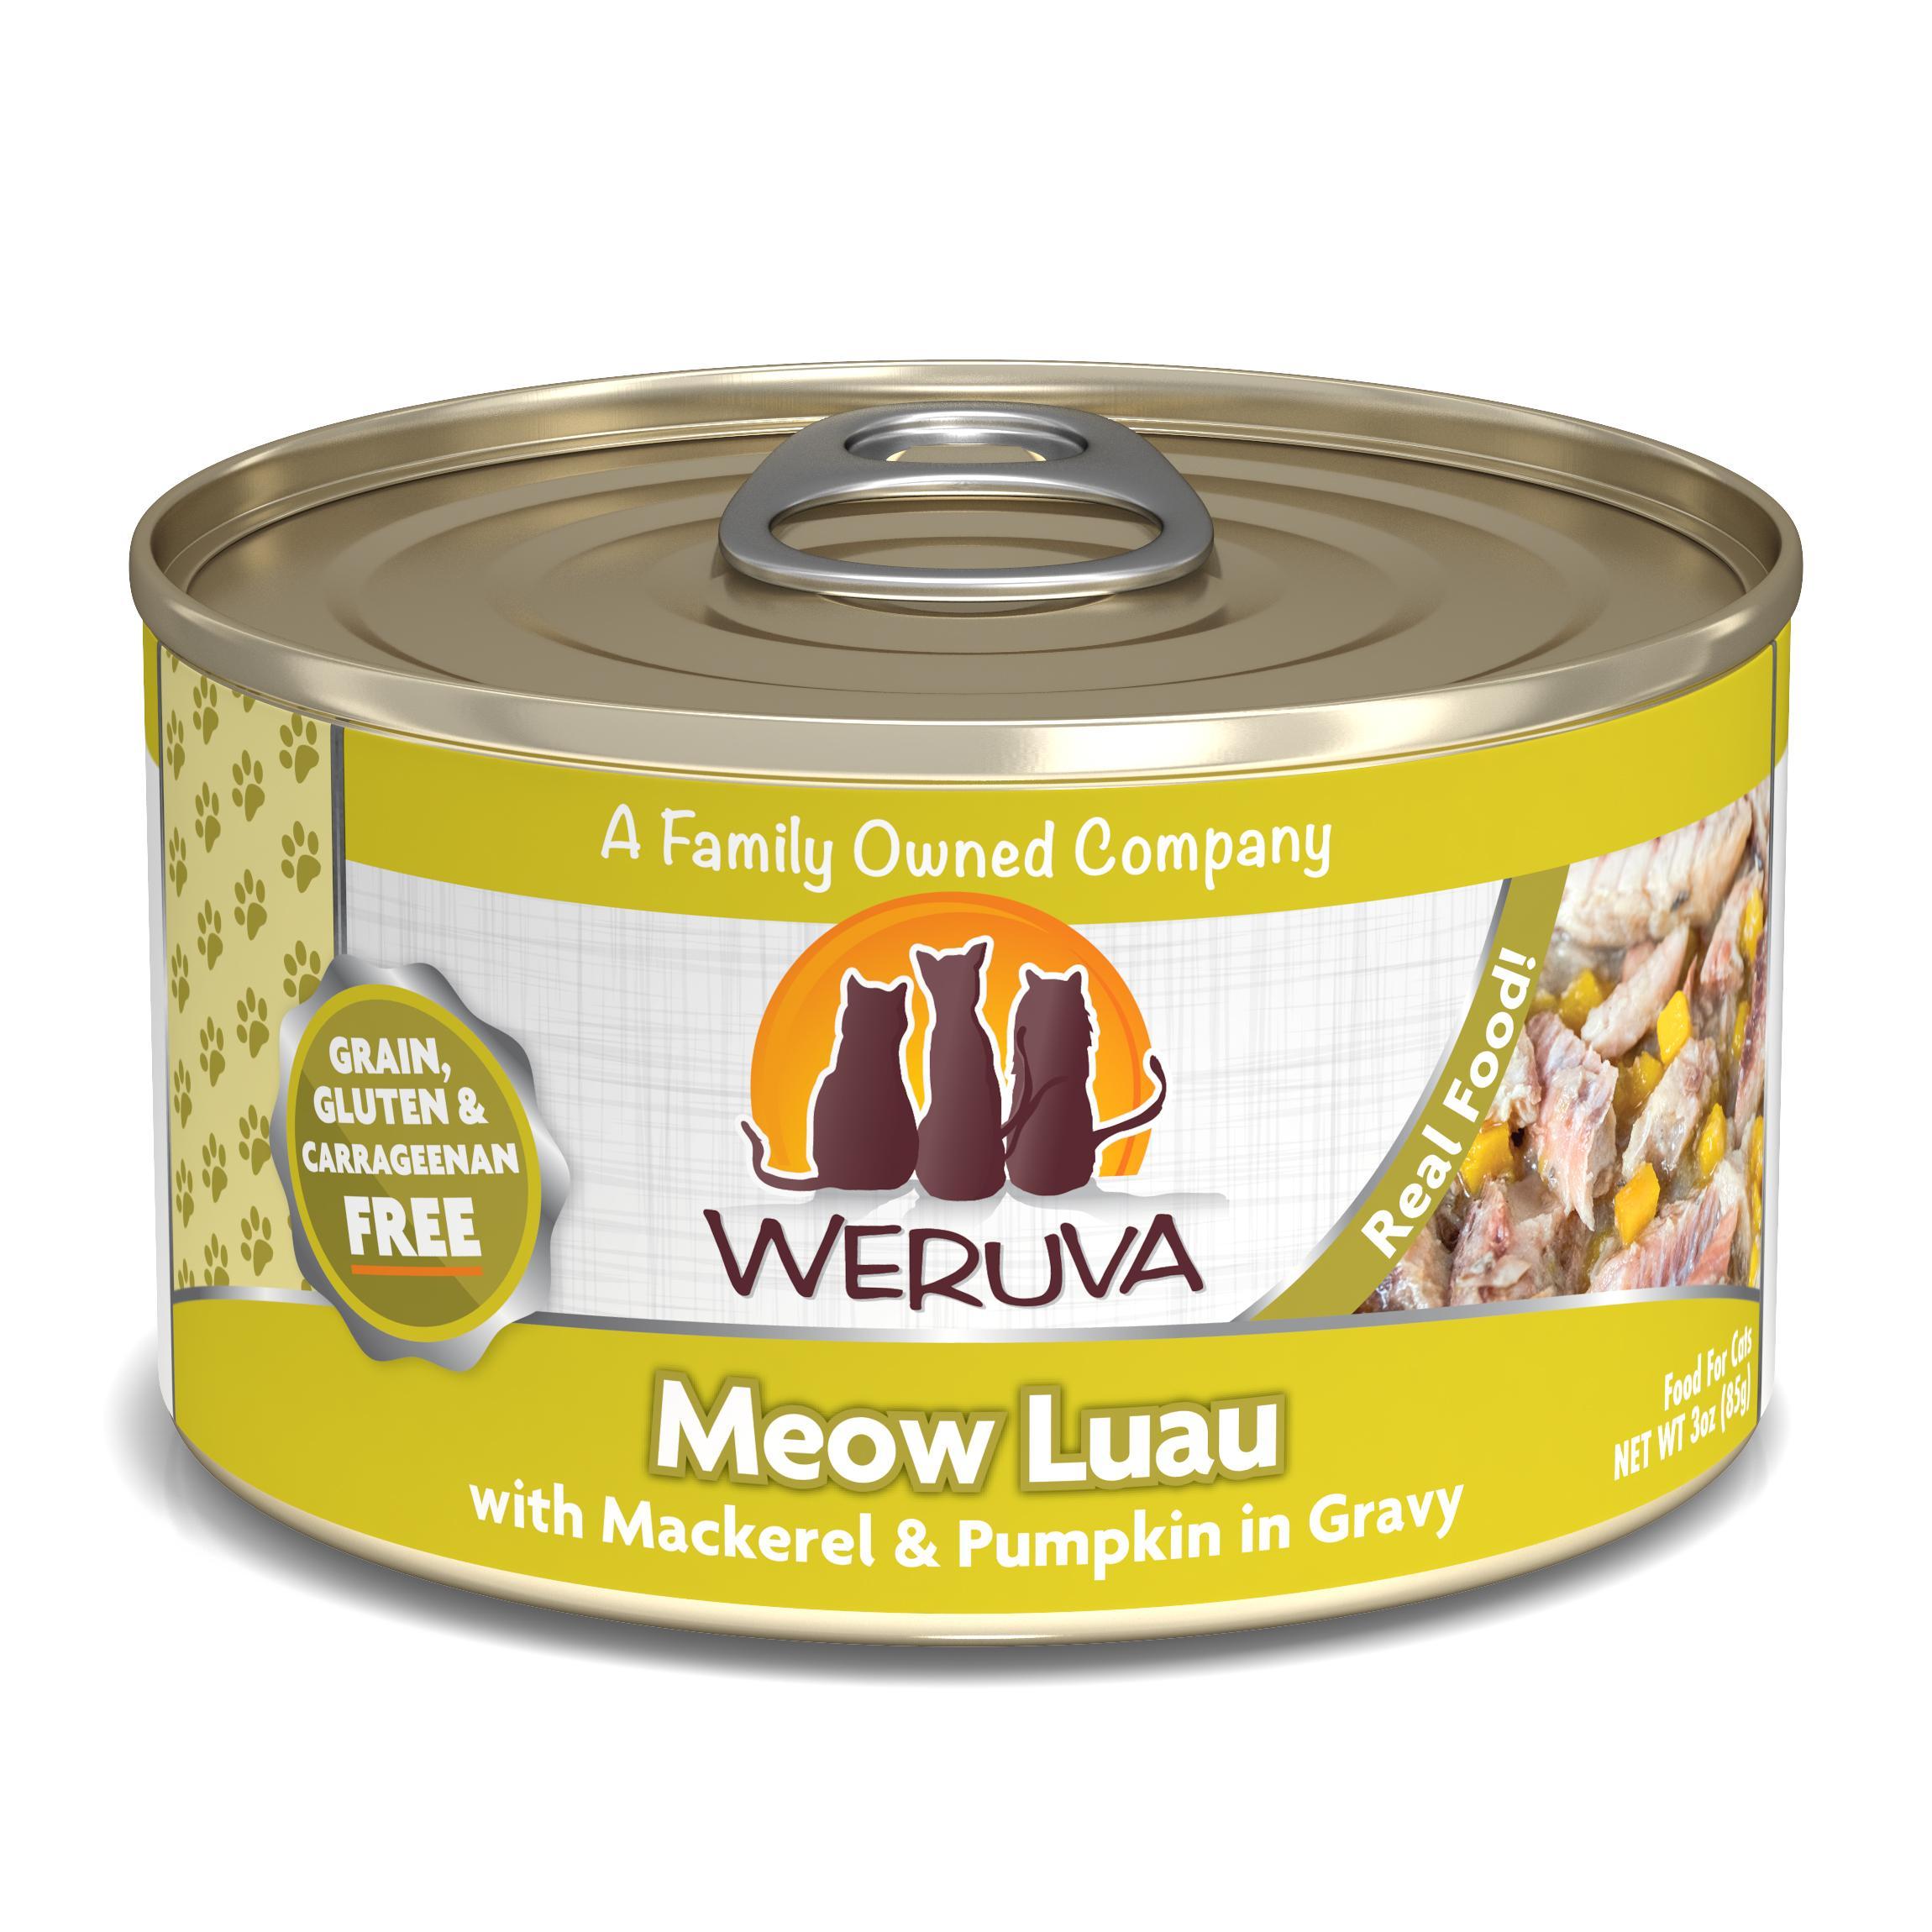 Weruva Cat Classic Meow Luau with Mackerel & Pumpkin Grain-Free Wet Cat Food Image